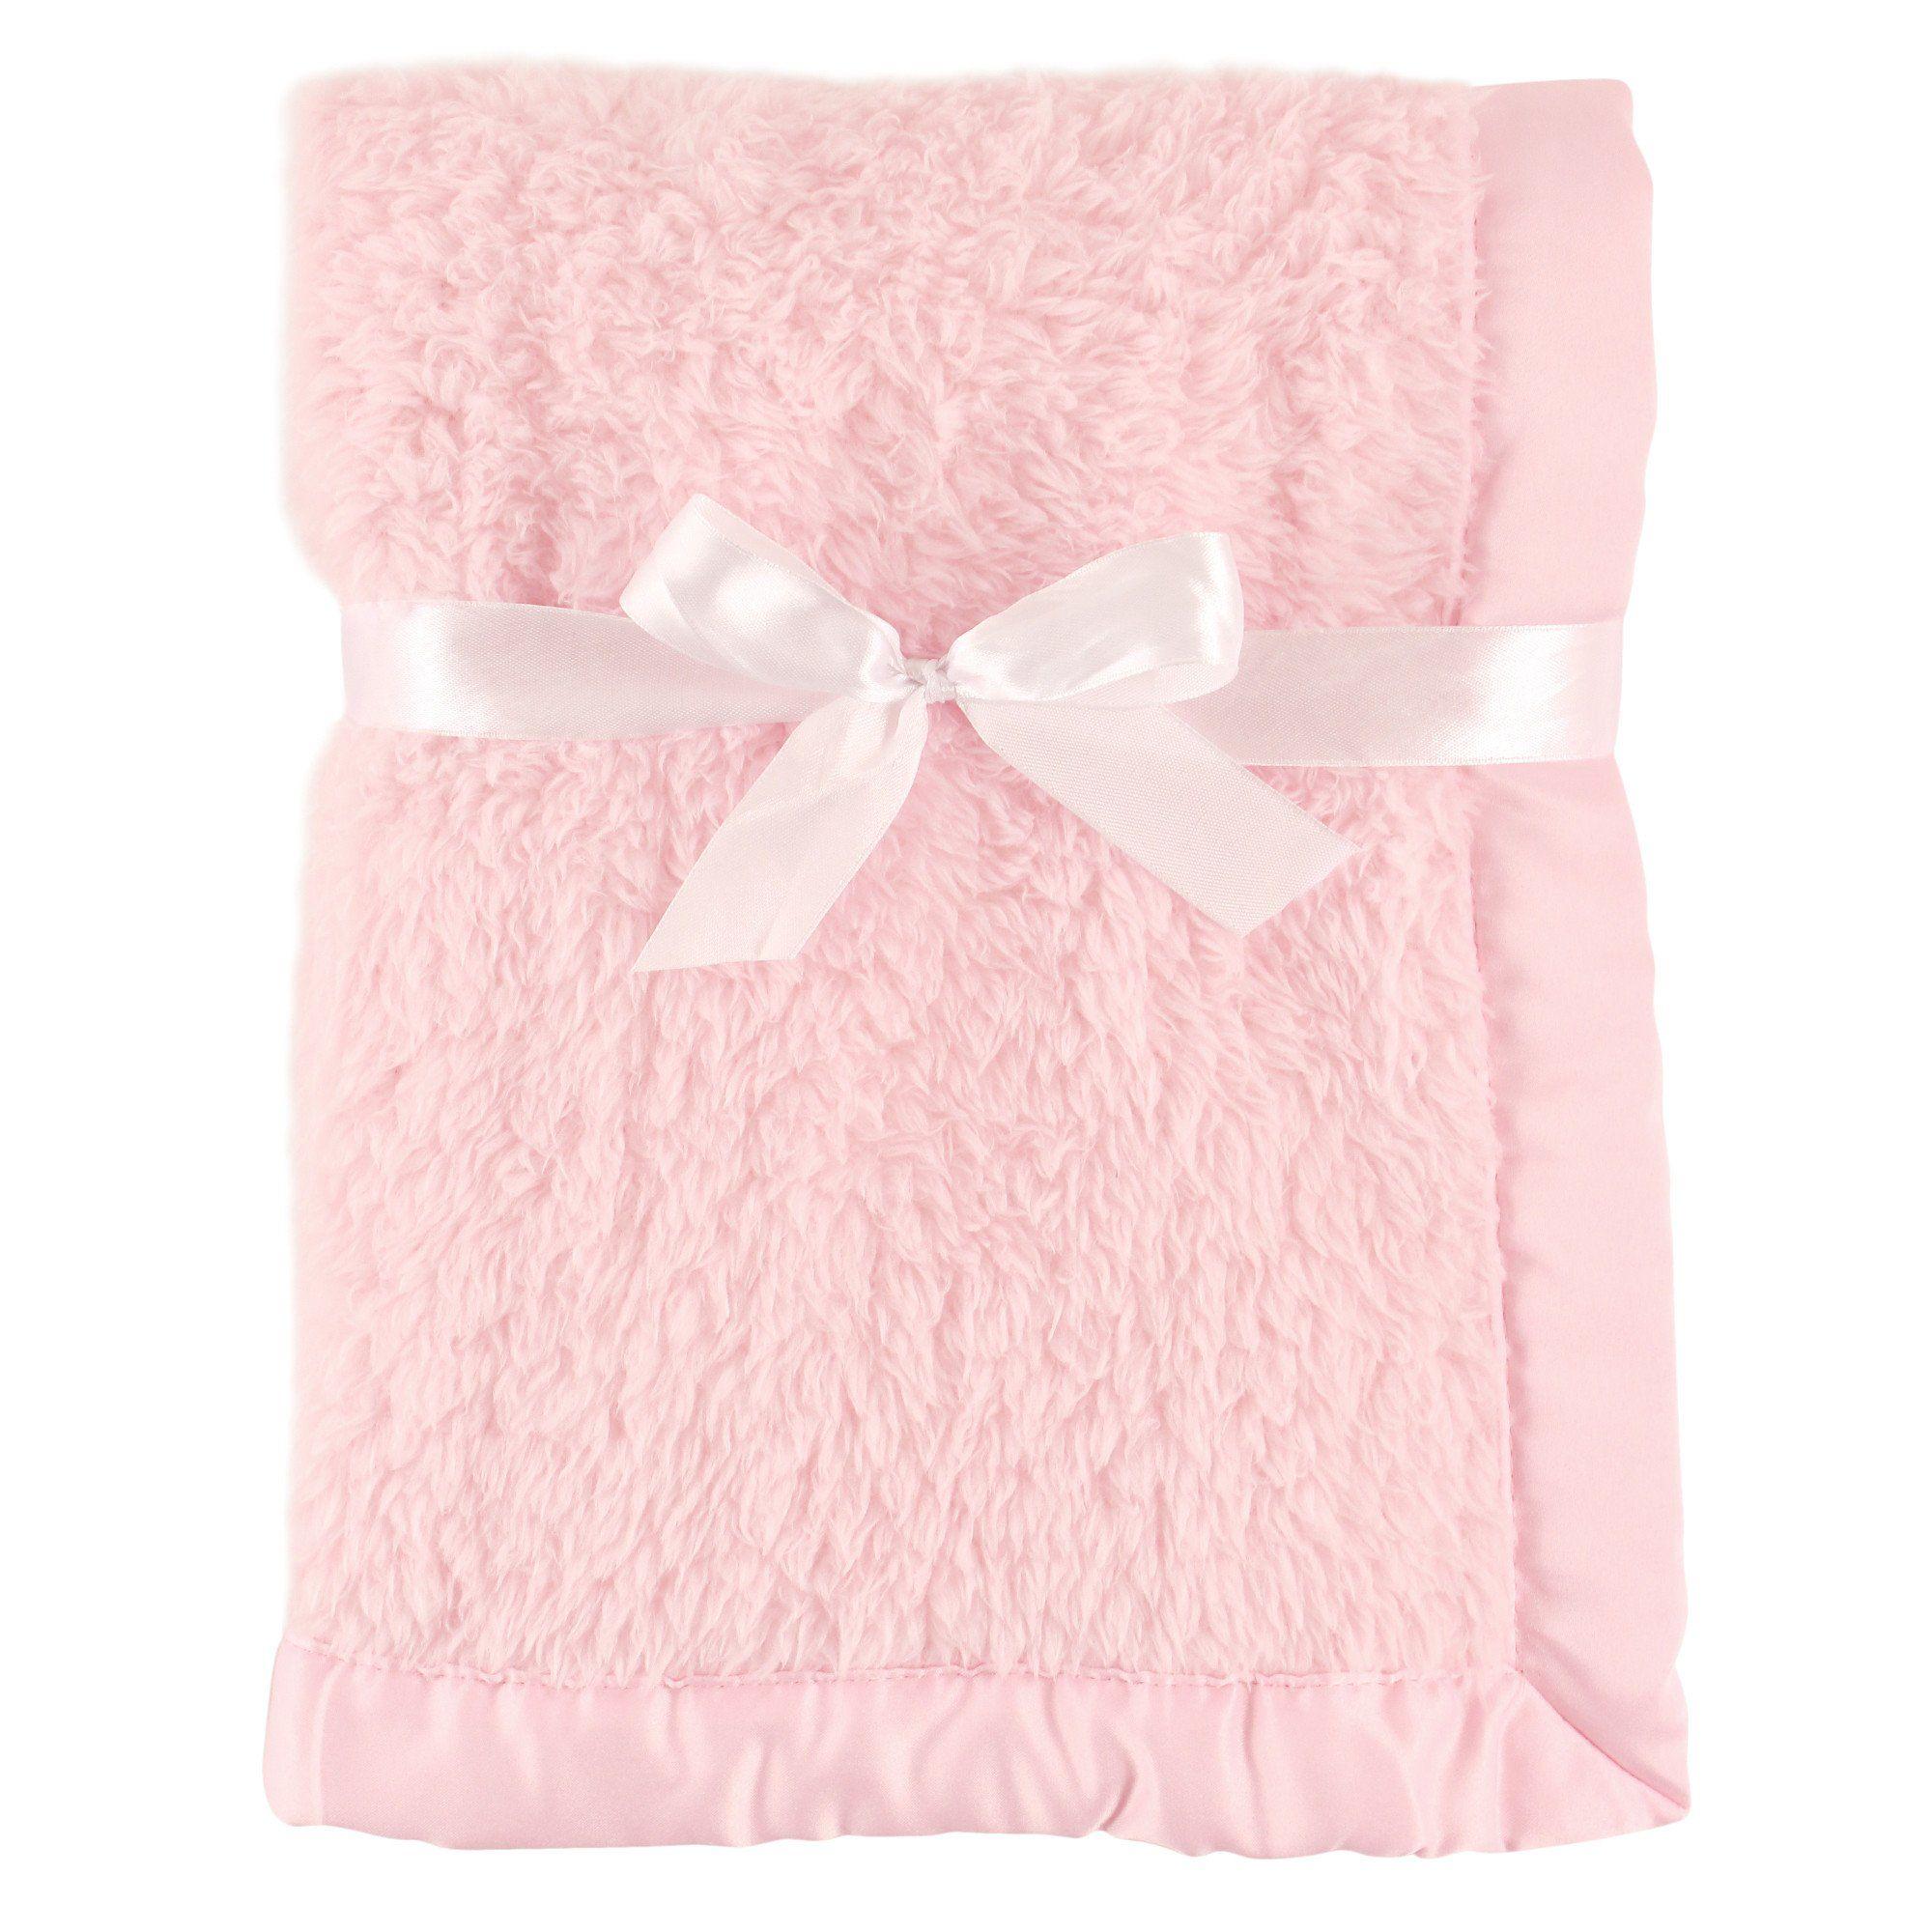 Pink Hudson Baby Sherpa Blanket with Satin Binding